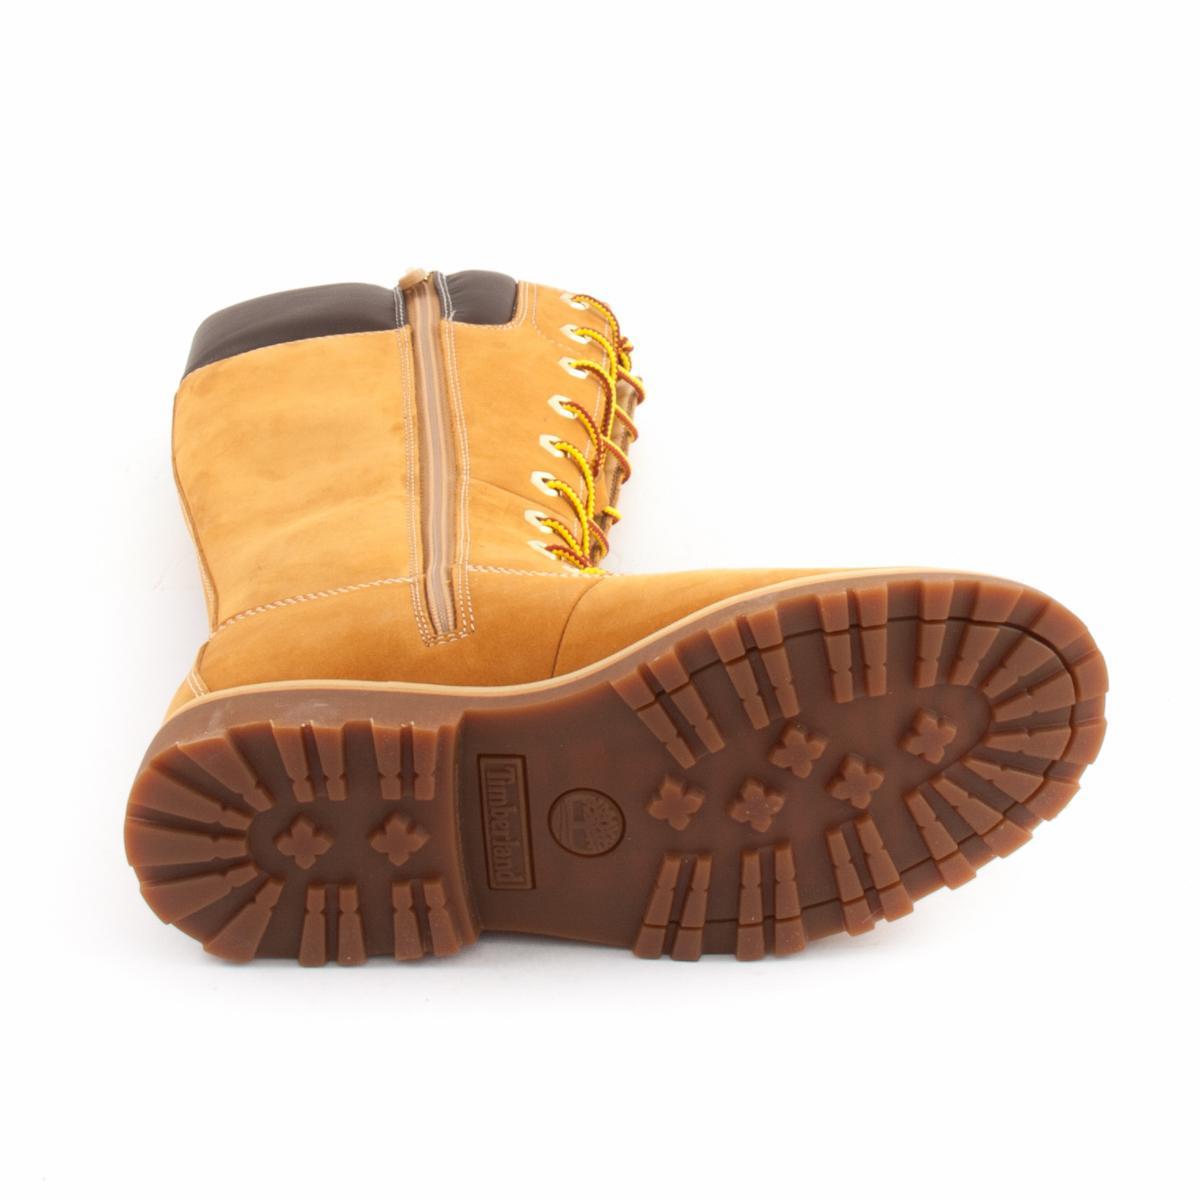 África Relajante Convertir  Boots TIMBERLAND 83980 Junior Girls Asphalt Trail Classic Lace-Up w/Side Zip